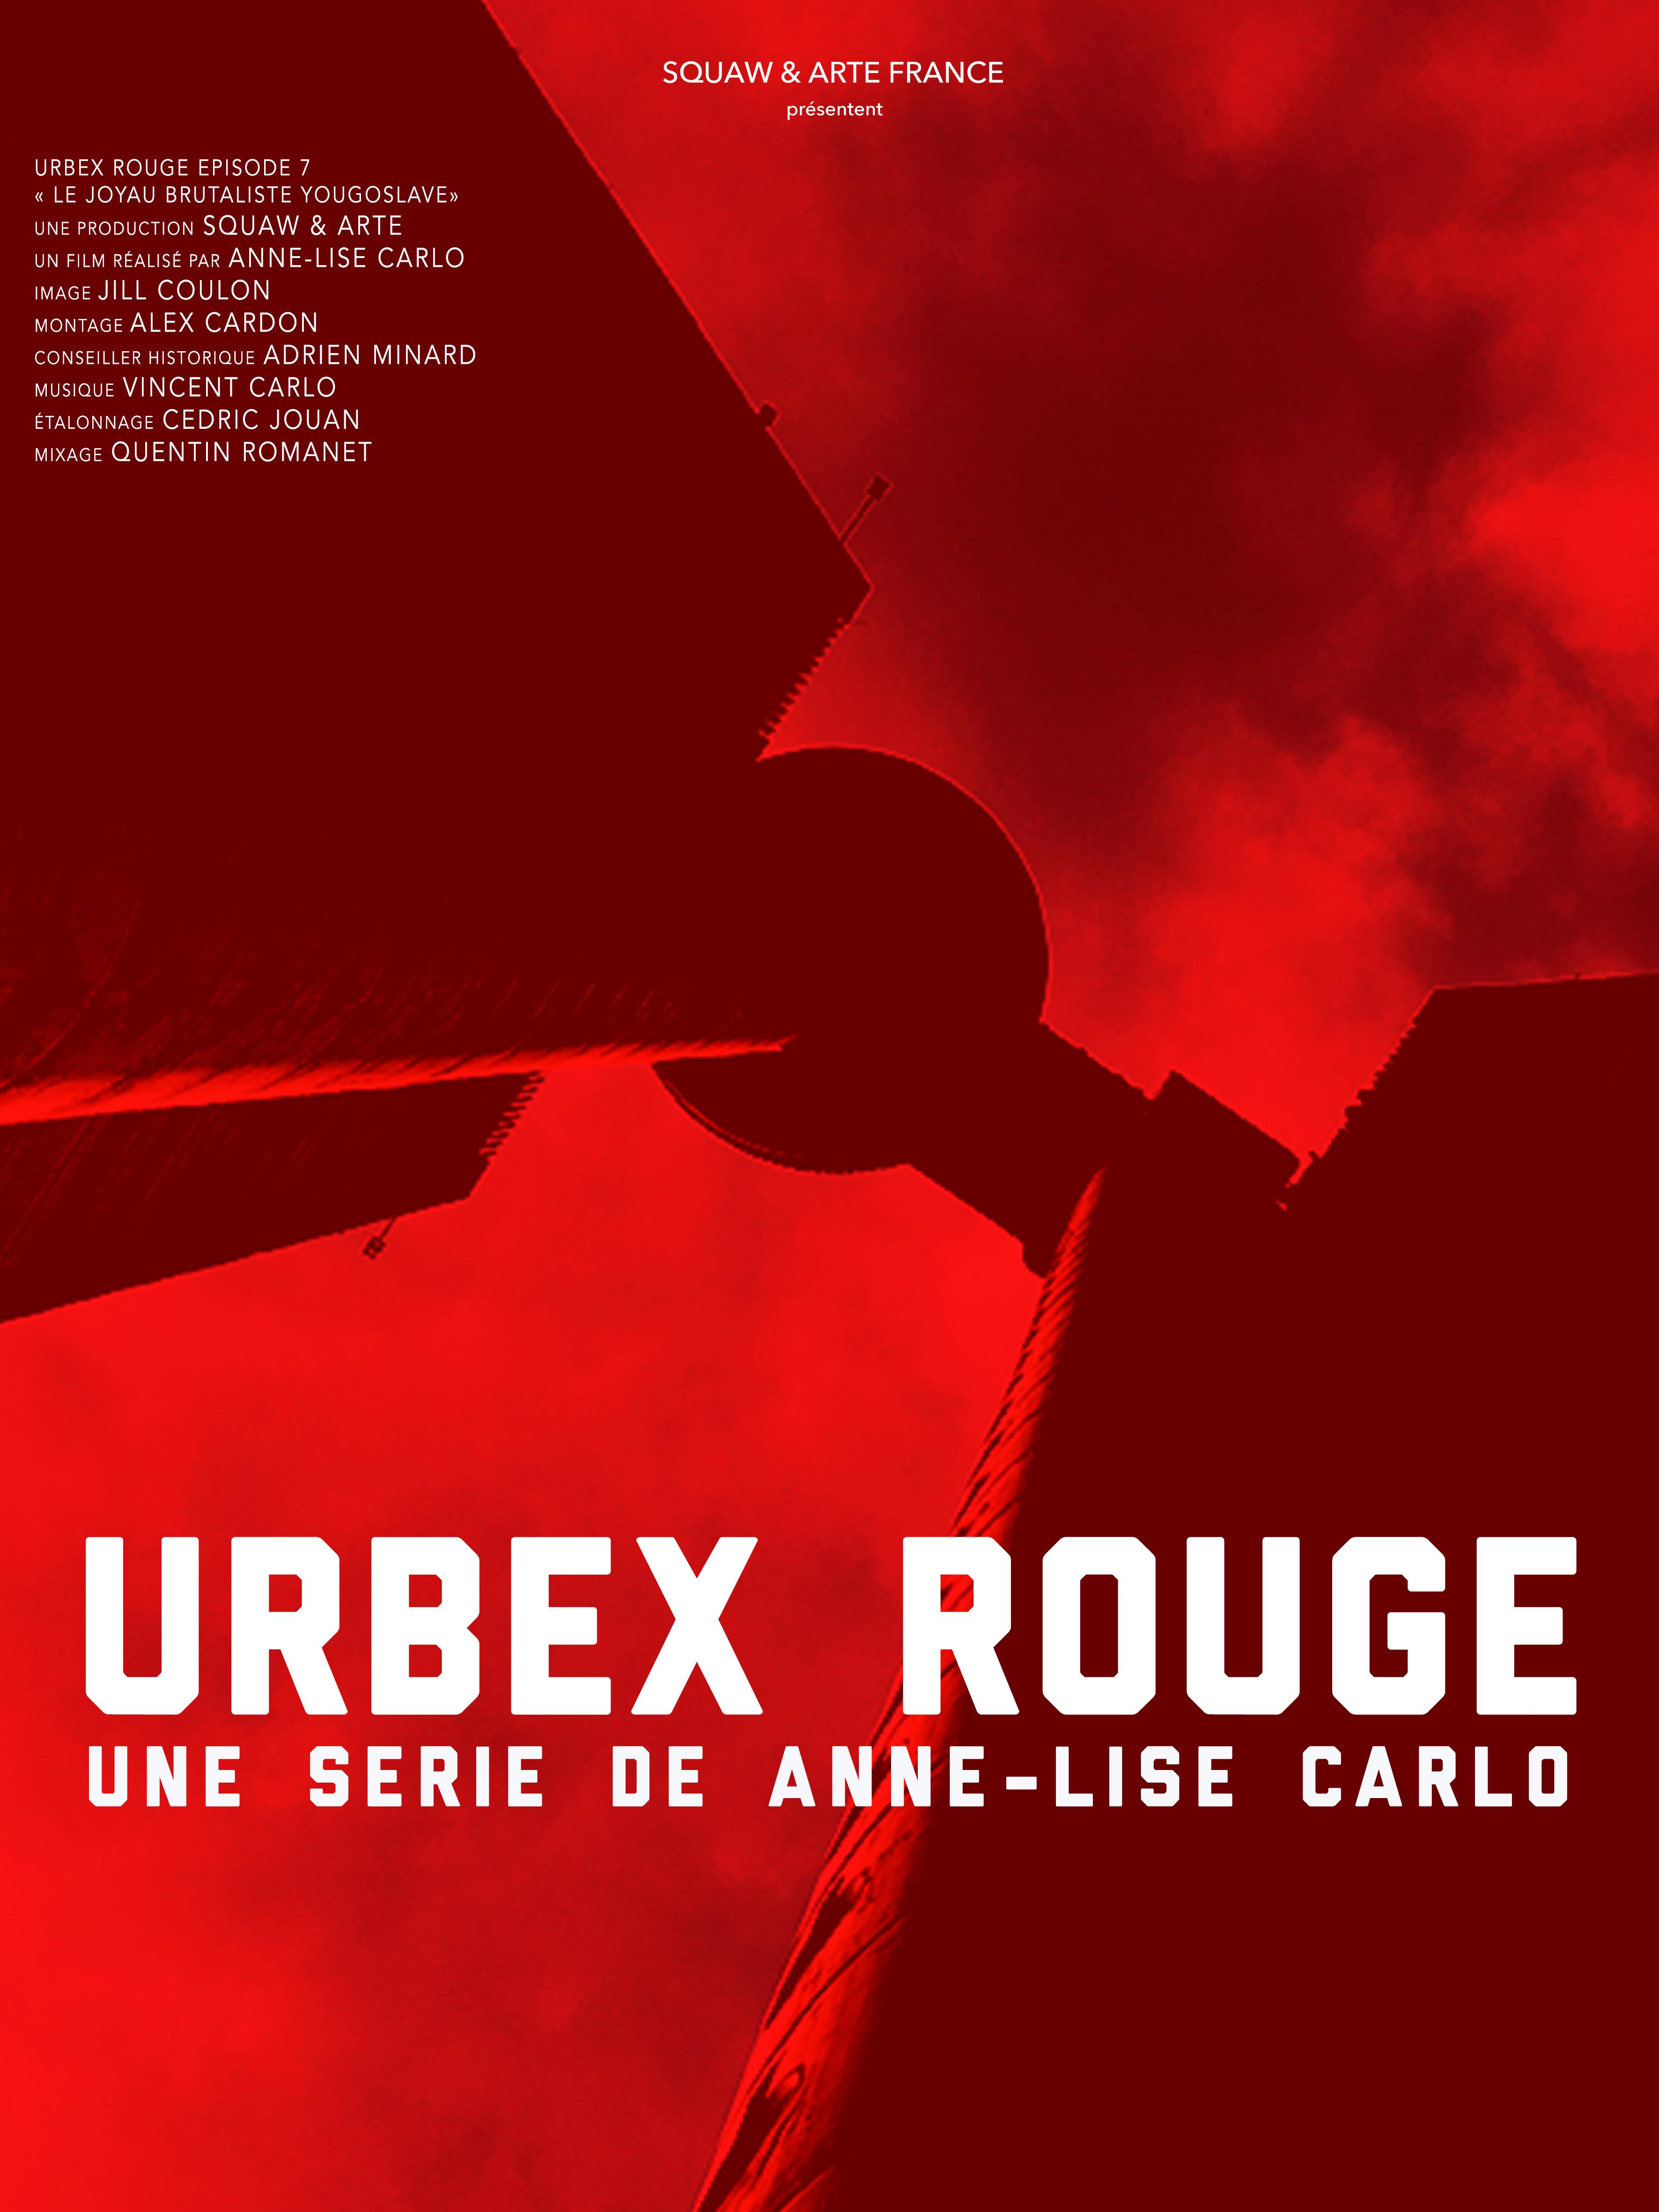 Urbex Rouge (Anne-Lise Carlo, 2019)